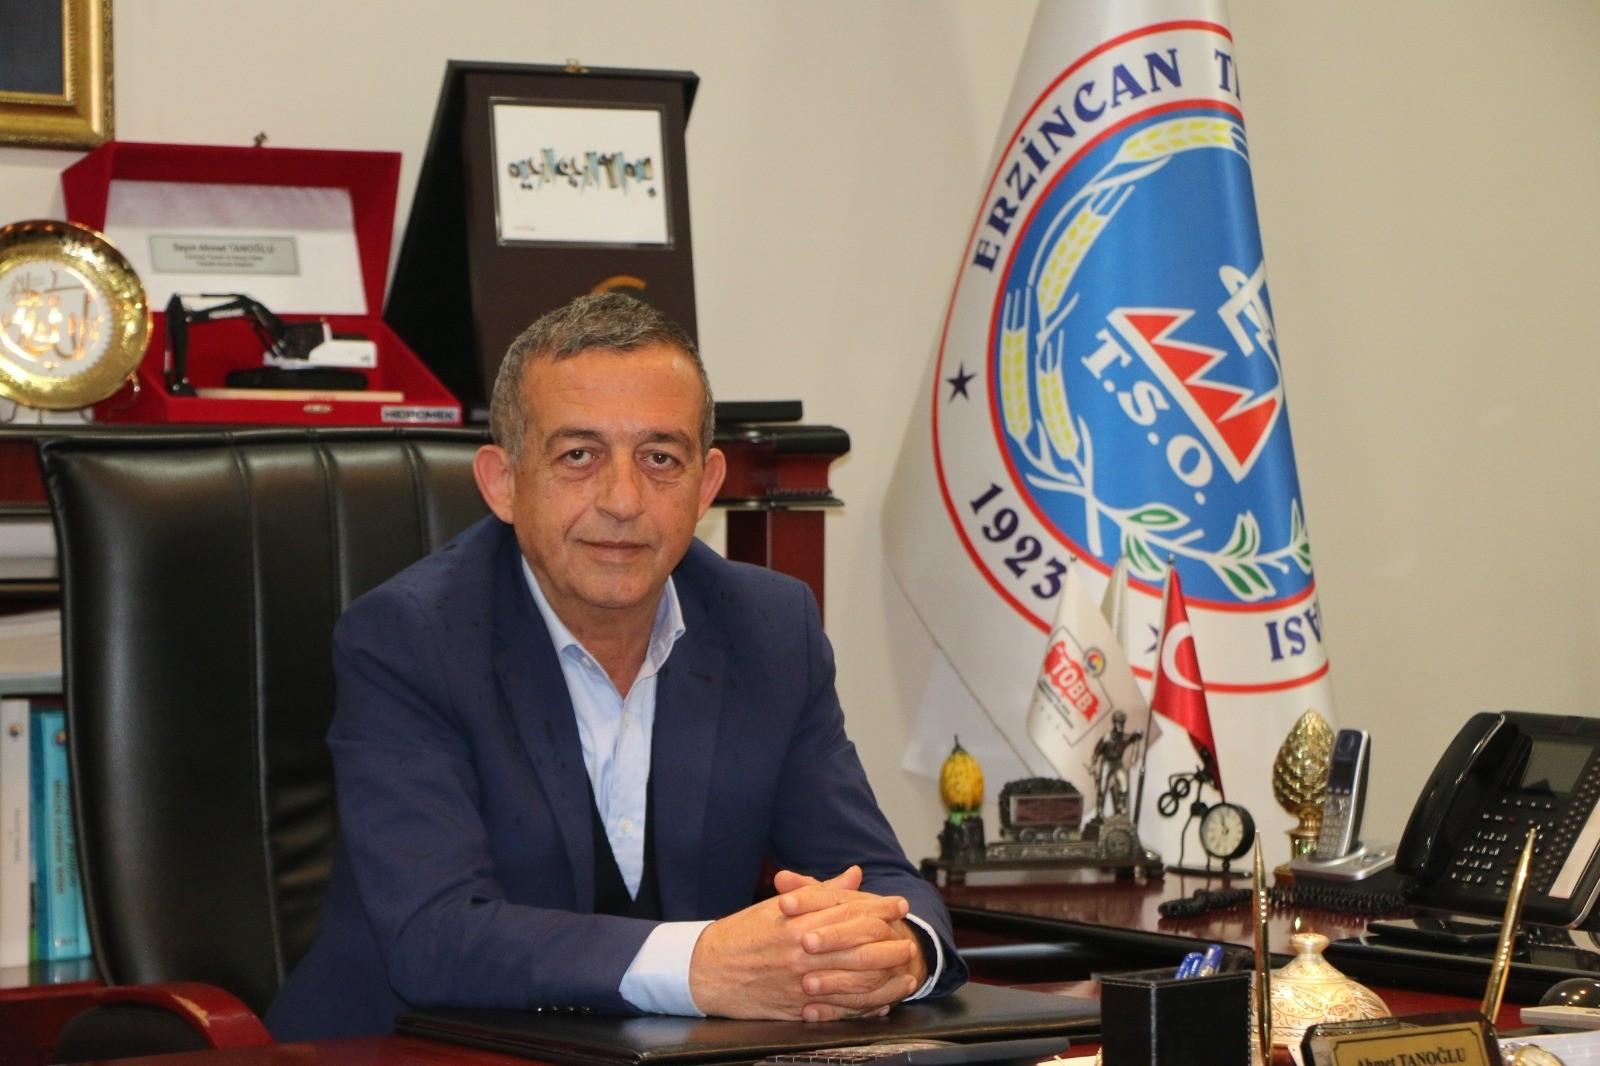 Erzincan TSO whatsapp iletişim hattı hizmete girdi